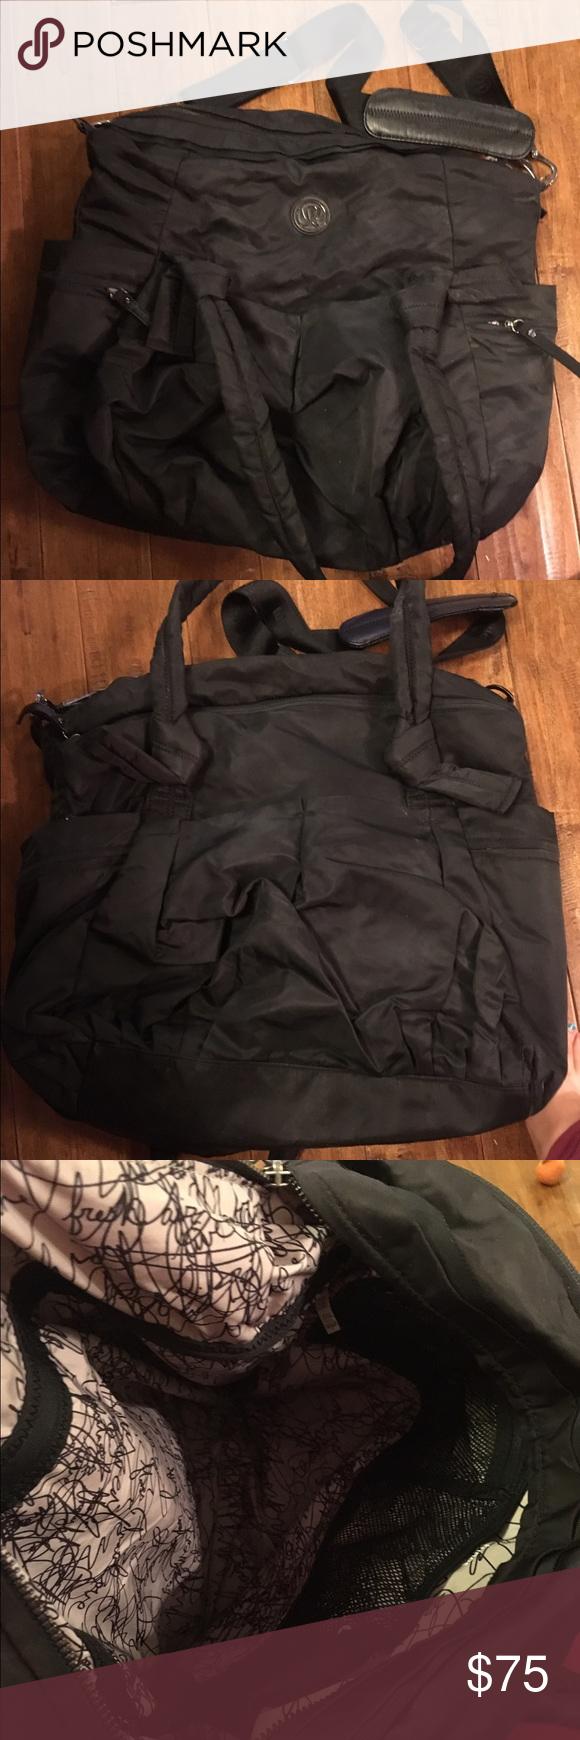 57d4739762c4 How To Clean Lululemon Gym Bag